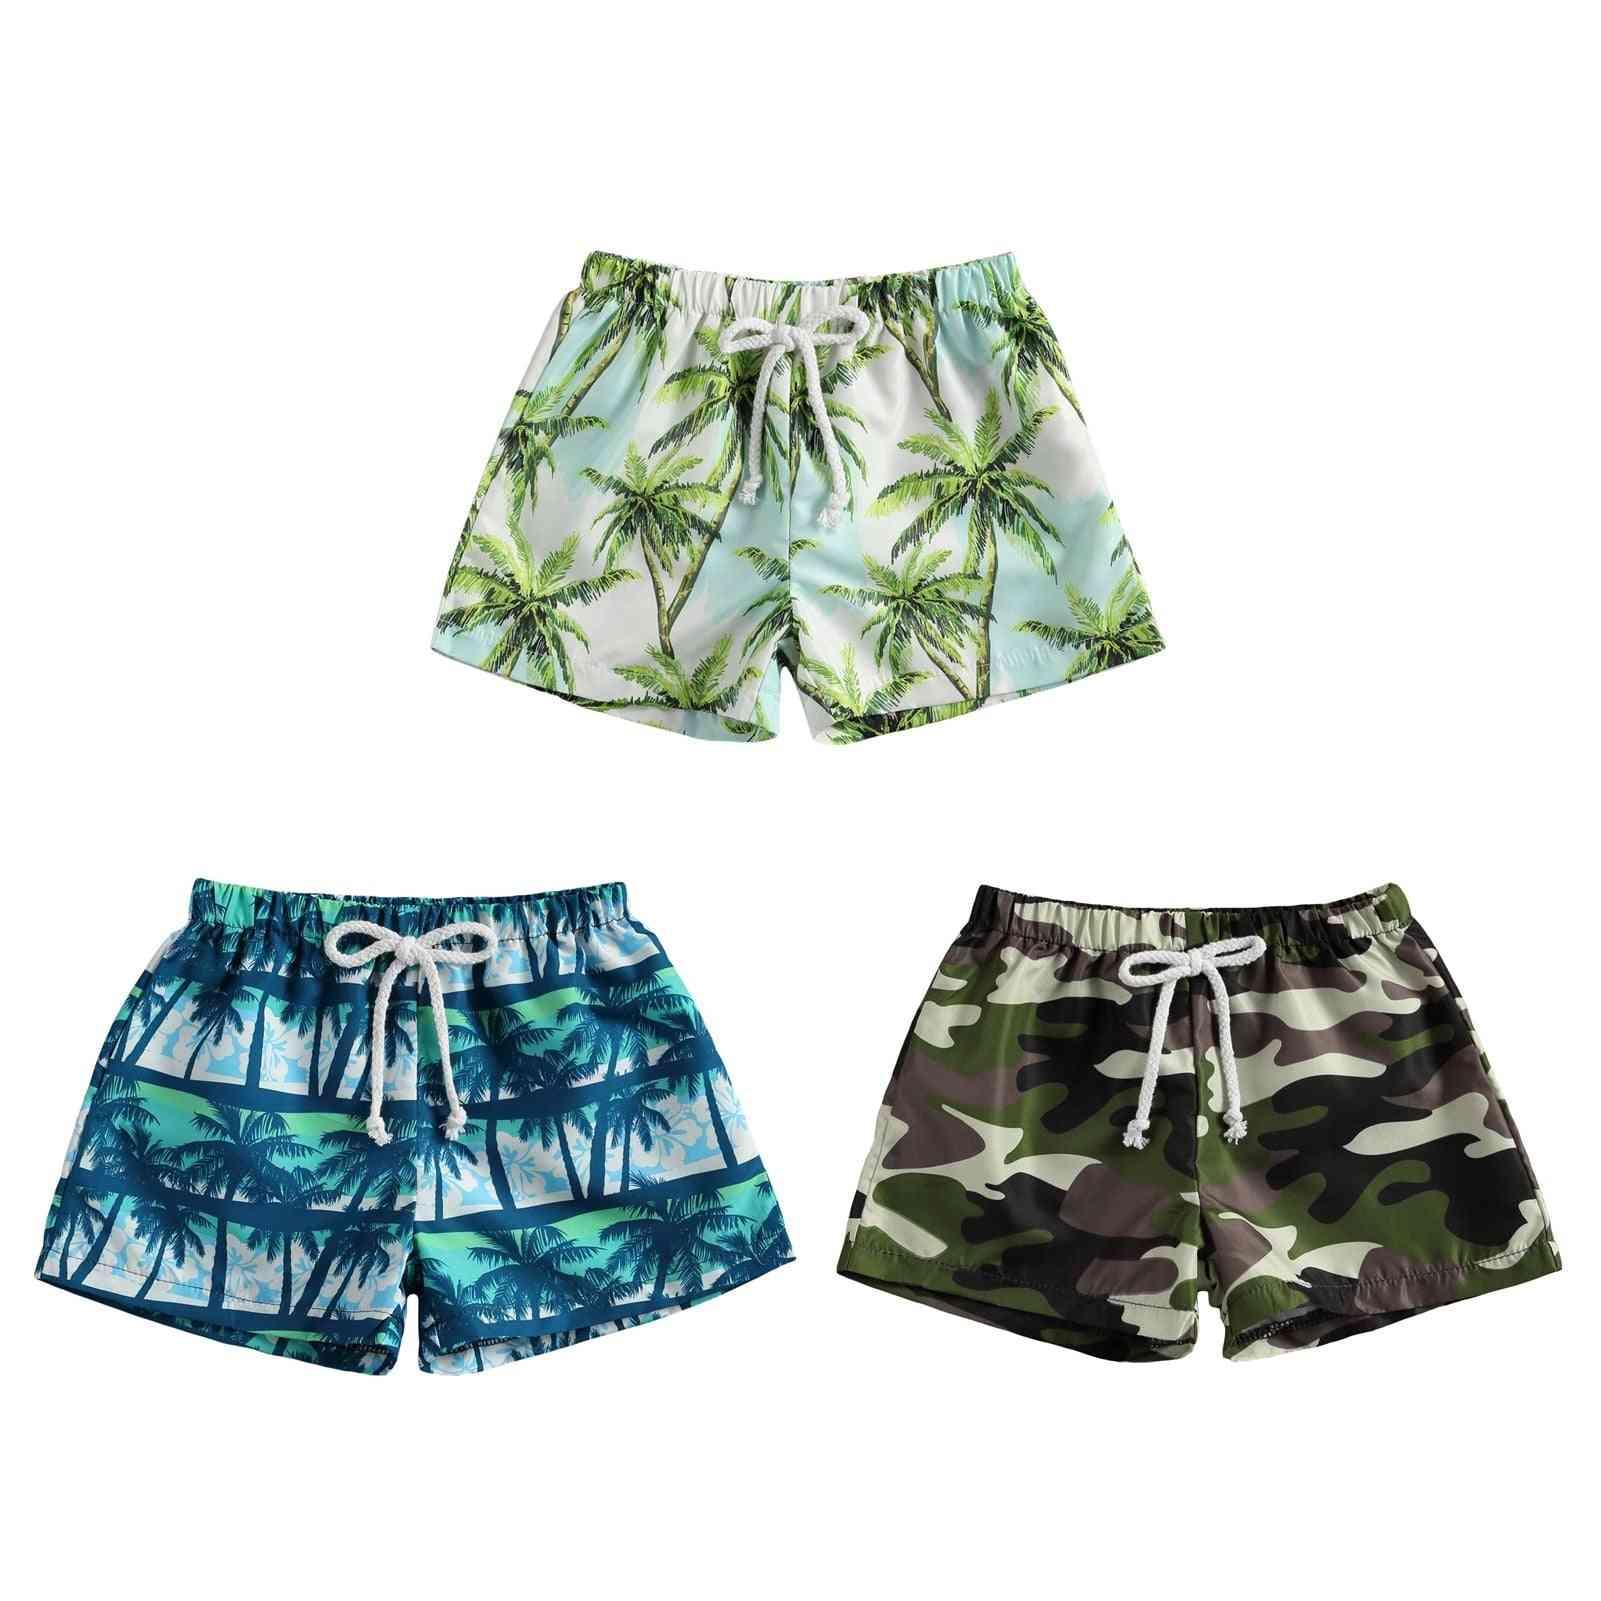 Baby Boy Swimwear Camouflage/palm Tree Print Board Shorts Beach Swimsuit